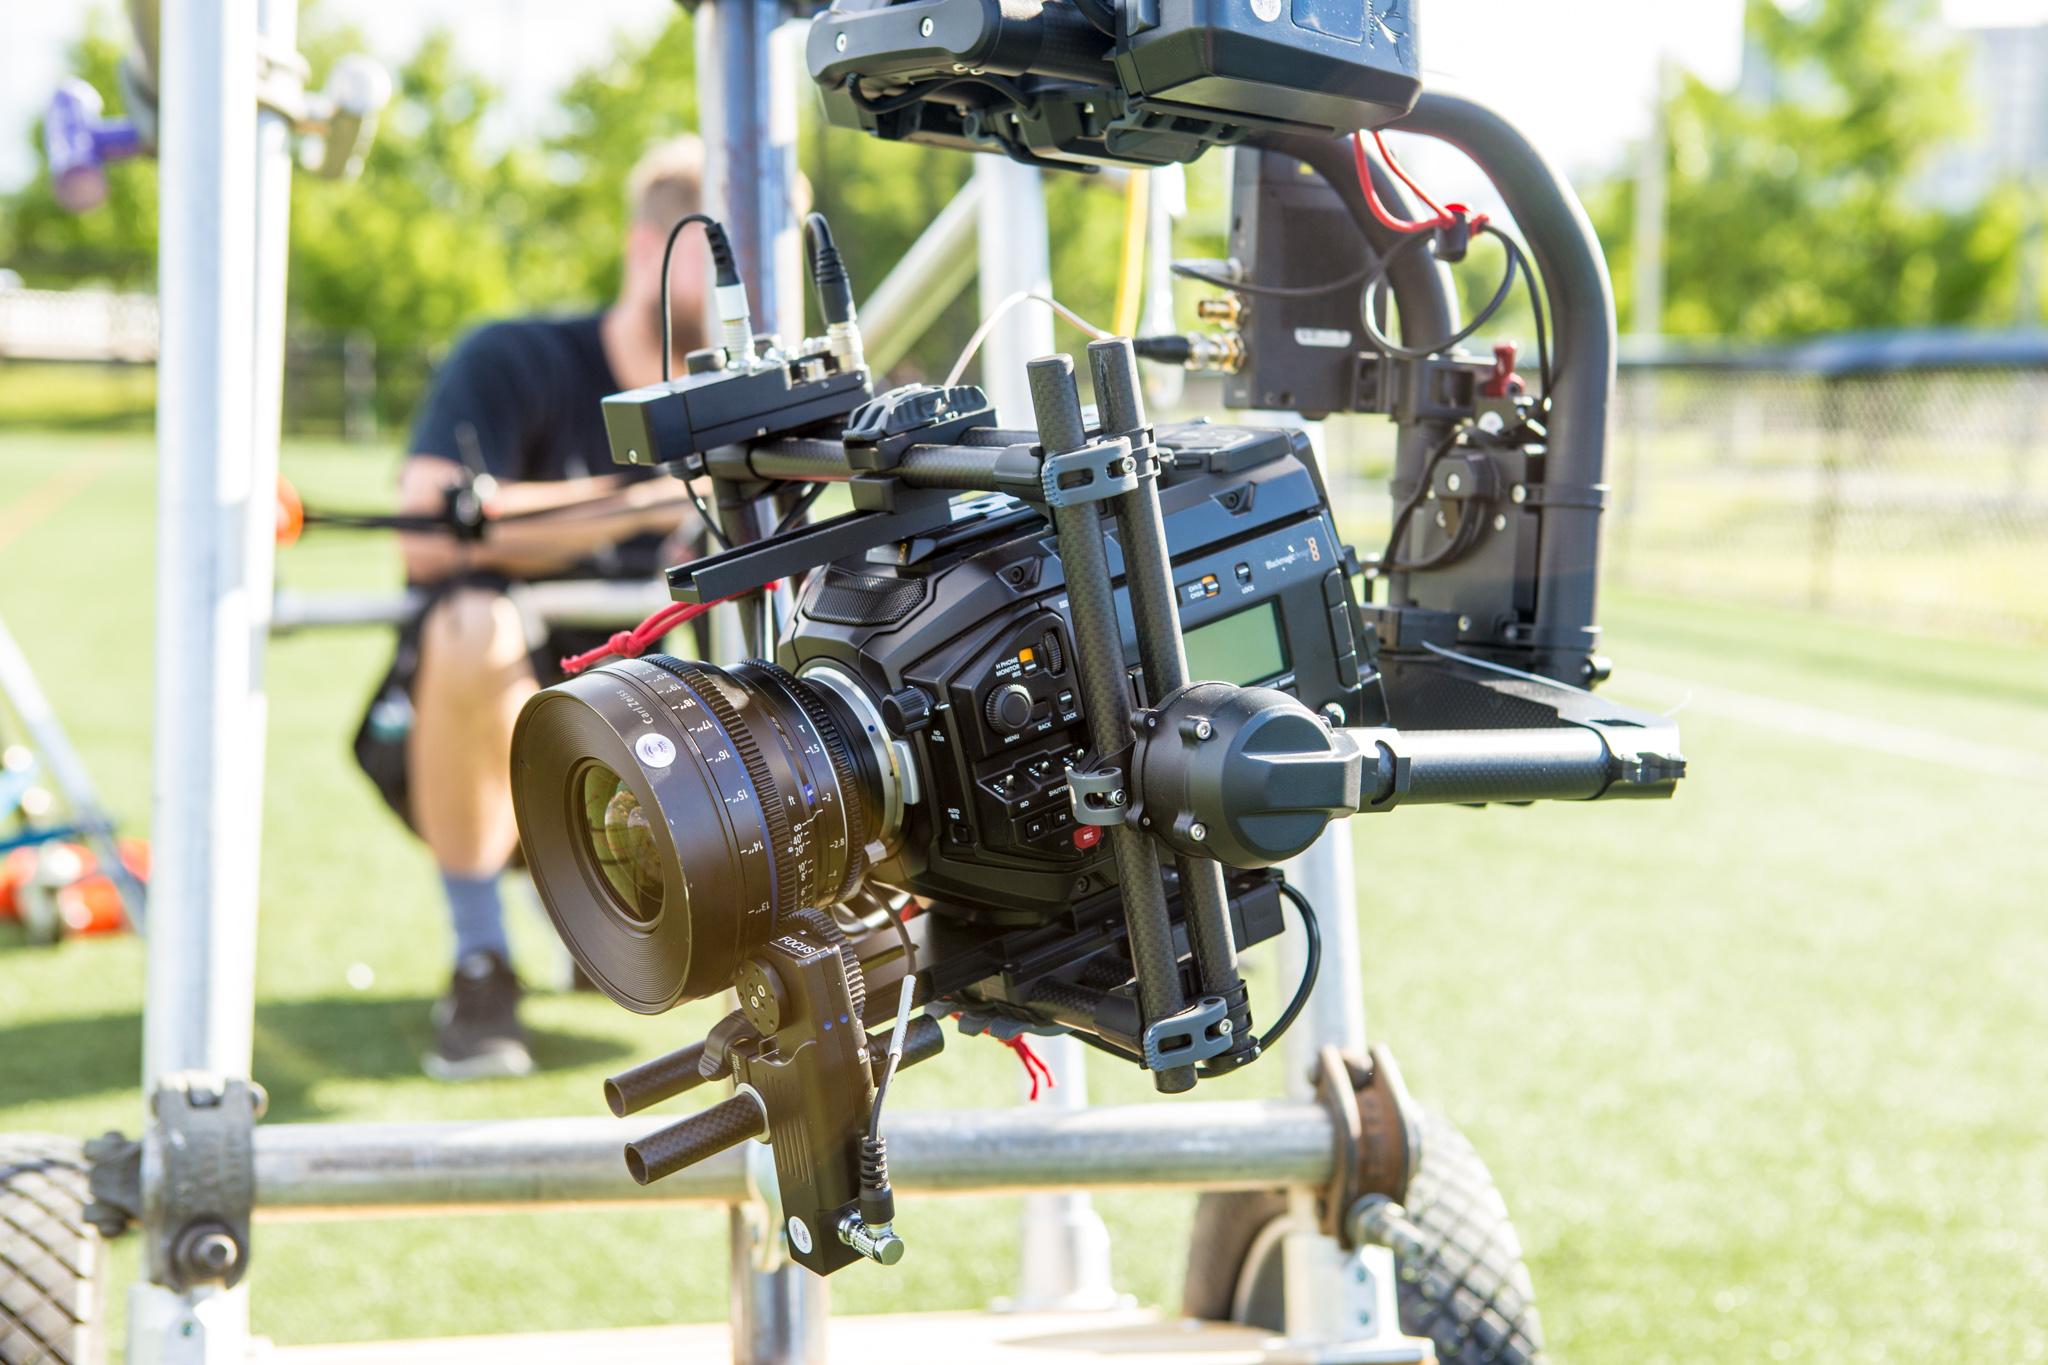 Our main cinema camera. The Black Magic Ursa Mini Pro 4.6k on a borrowed Movi Pro, Canon CN-E lens, Teradek Bolt sdi transmitter, and RT Motion wireless follow focus.